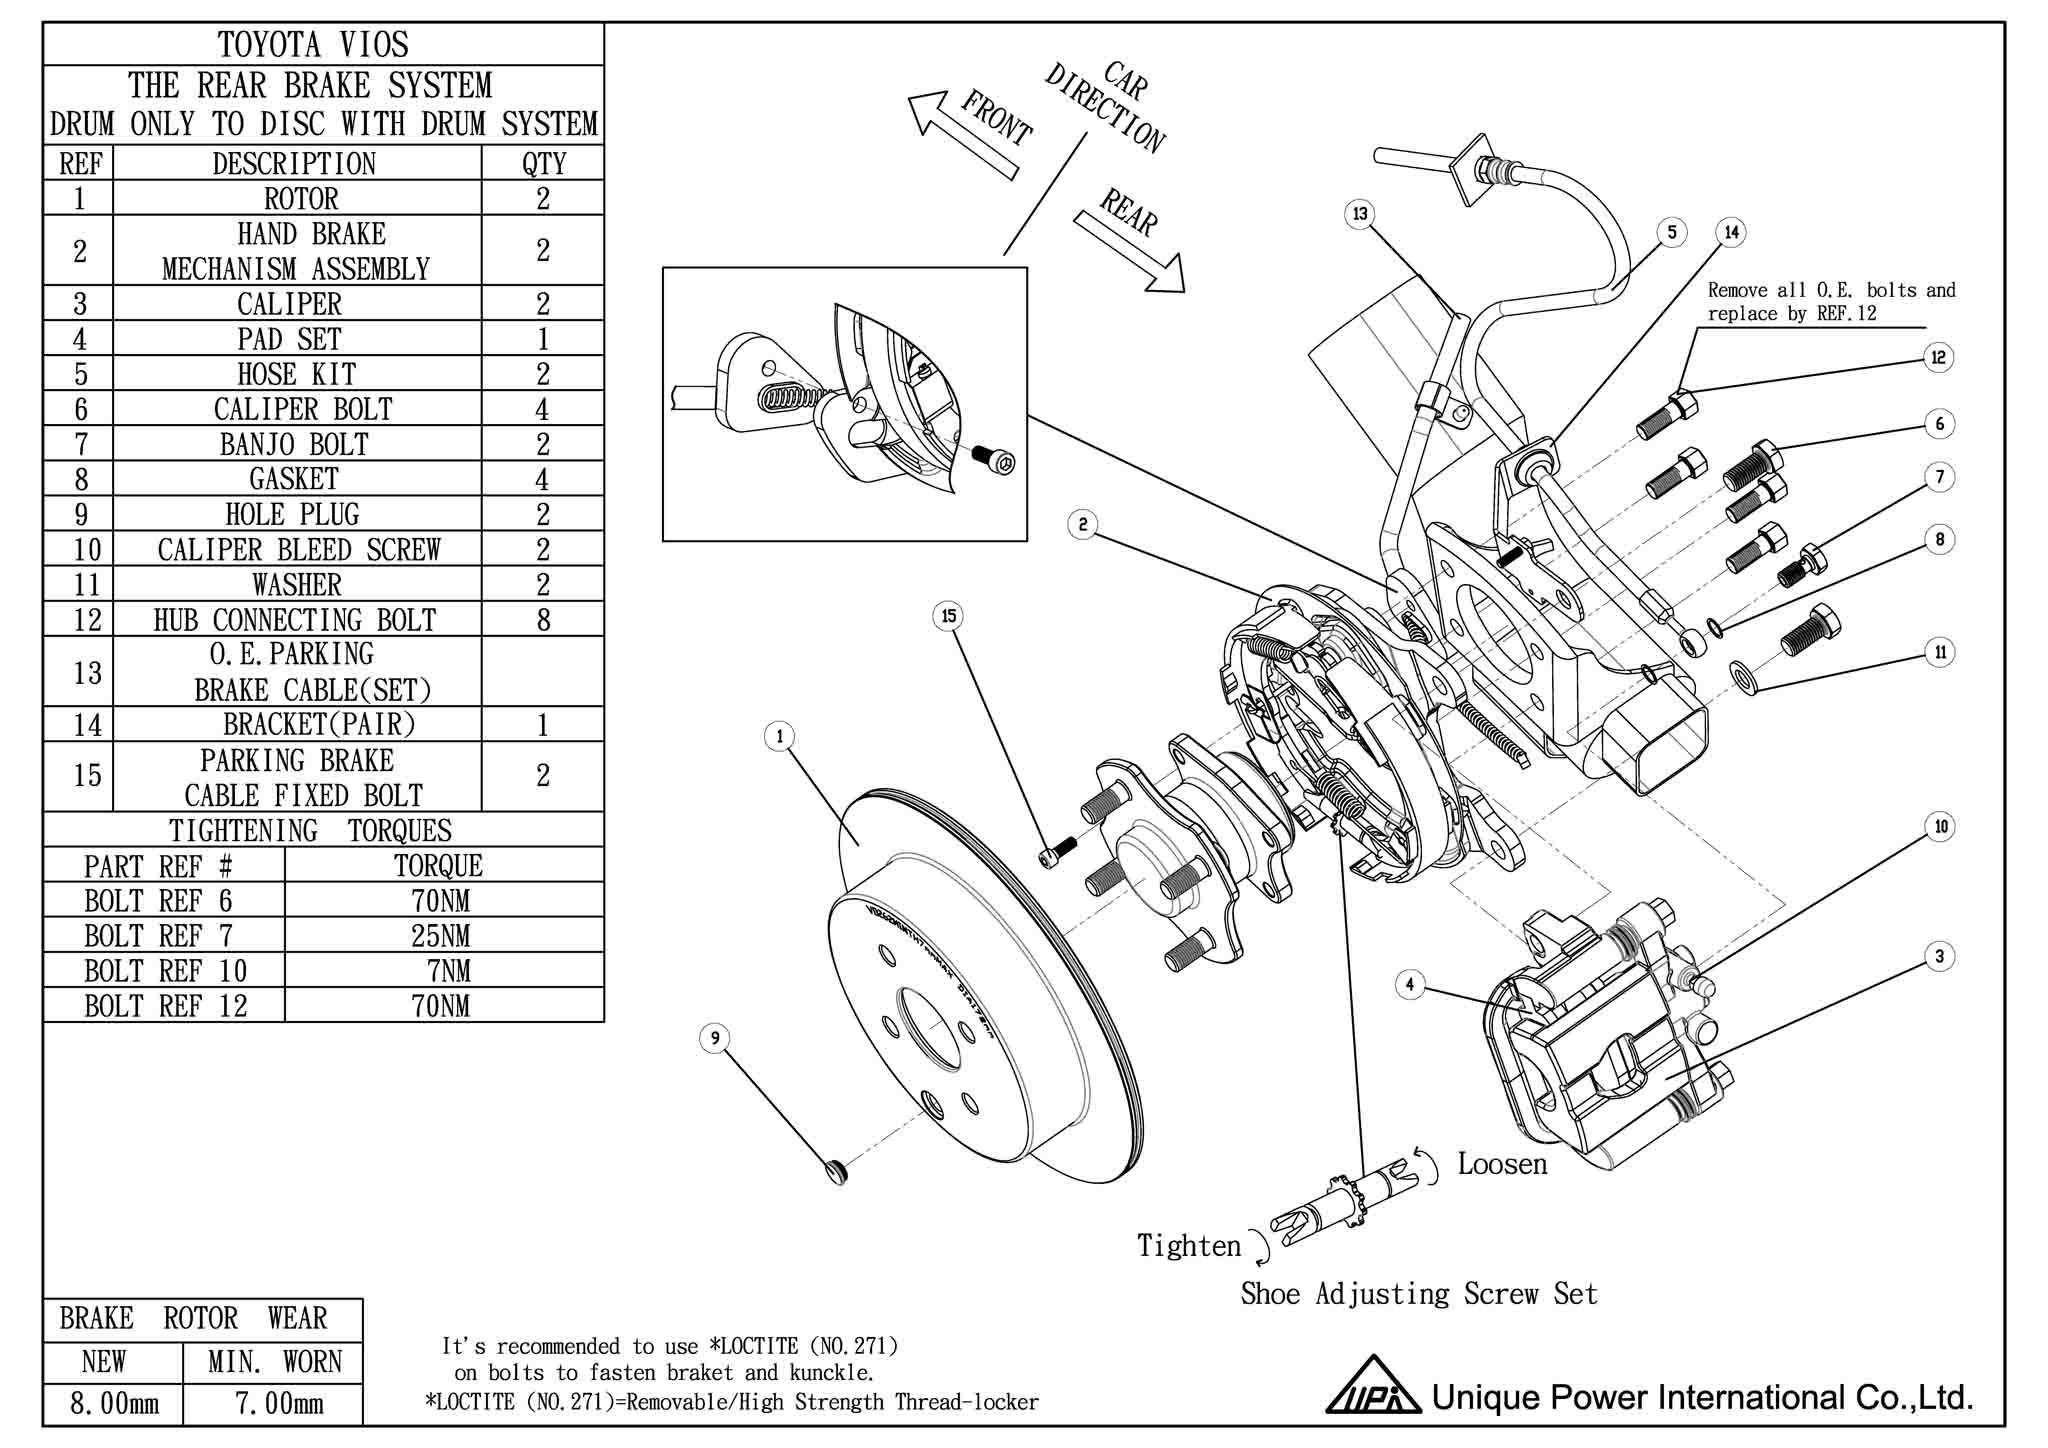 Wiring Diagram Toyota Vios : Toyota vios rear drum to disc installation guide unique